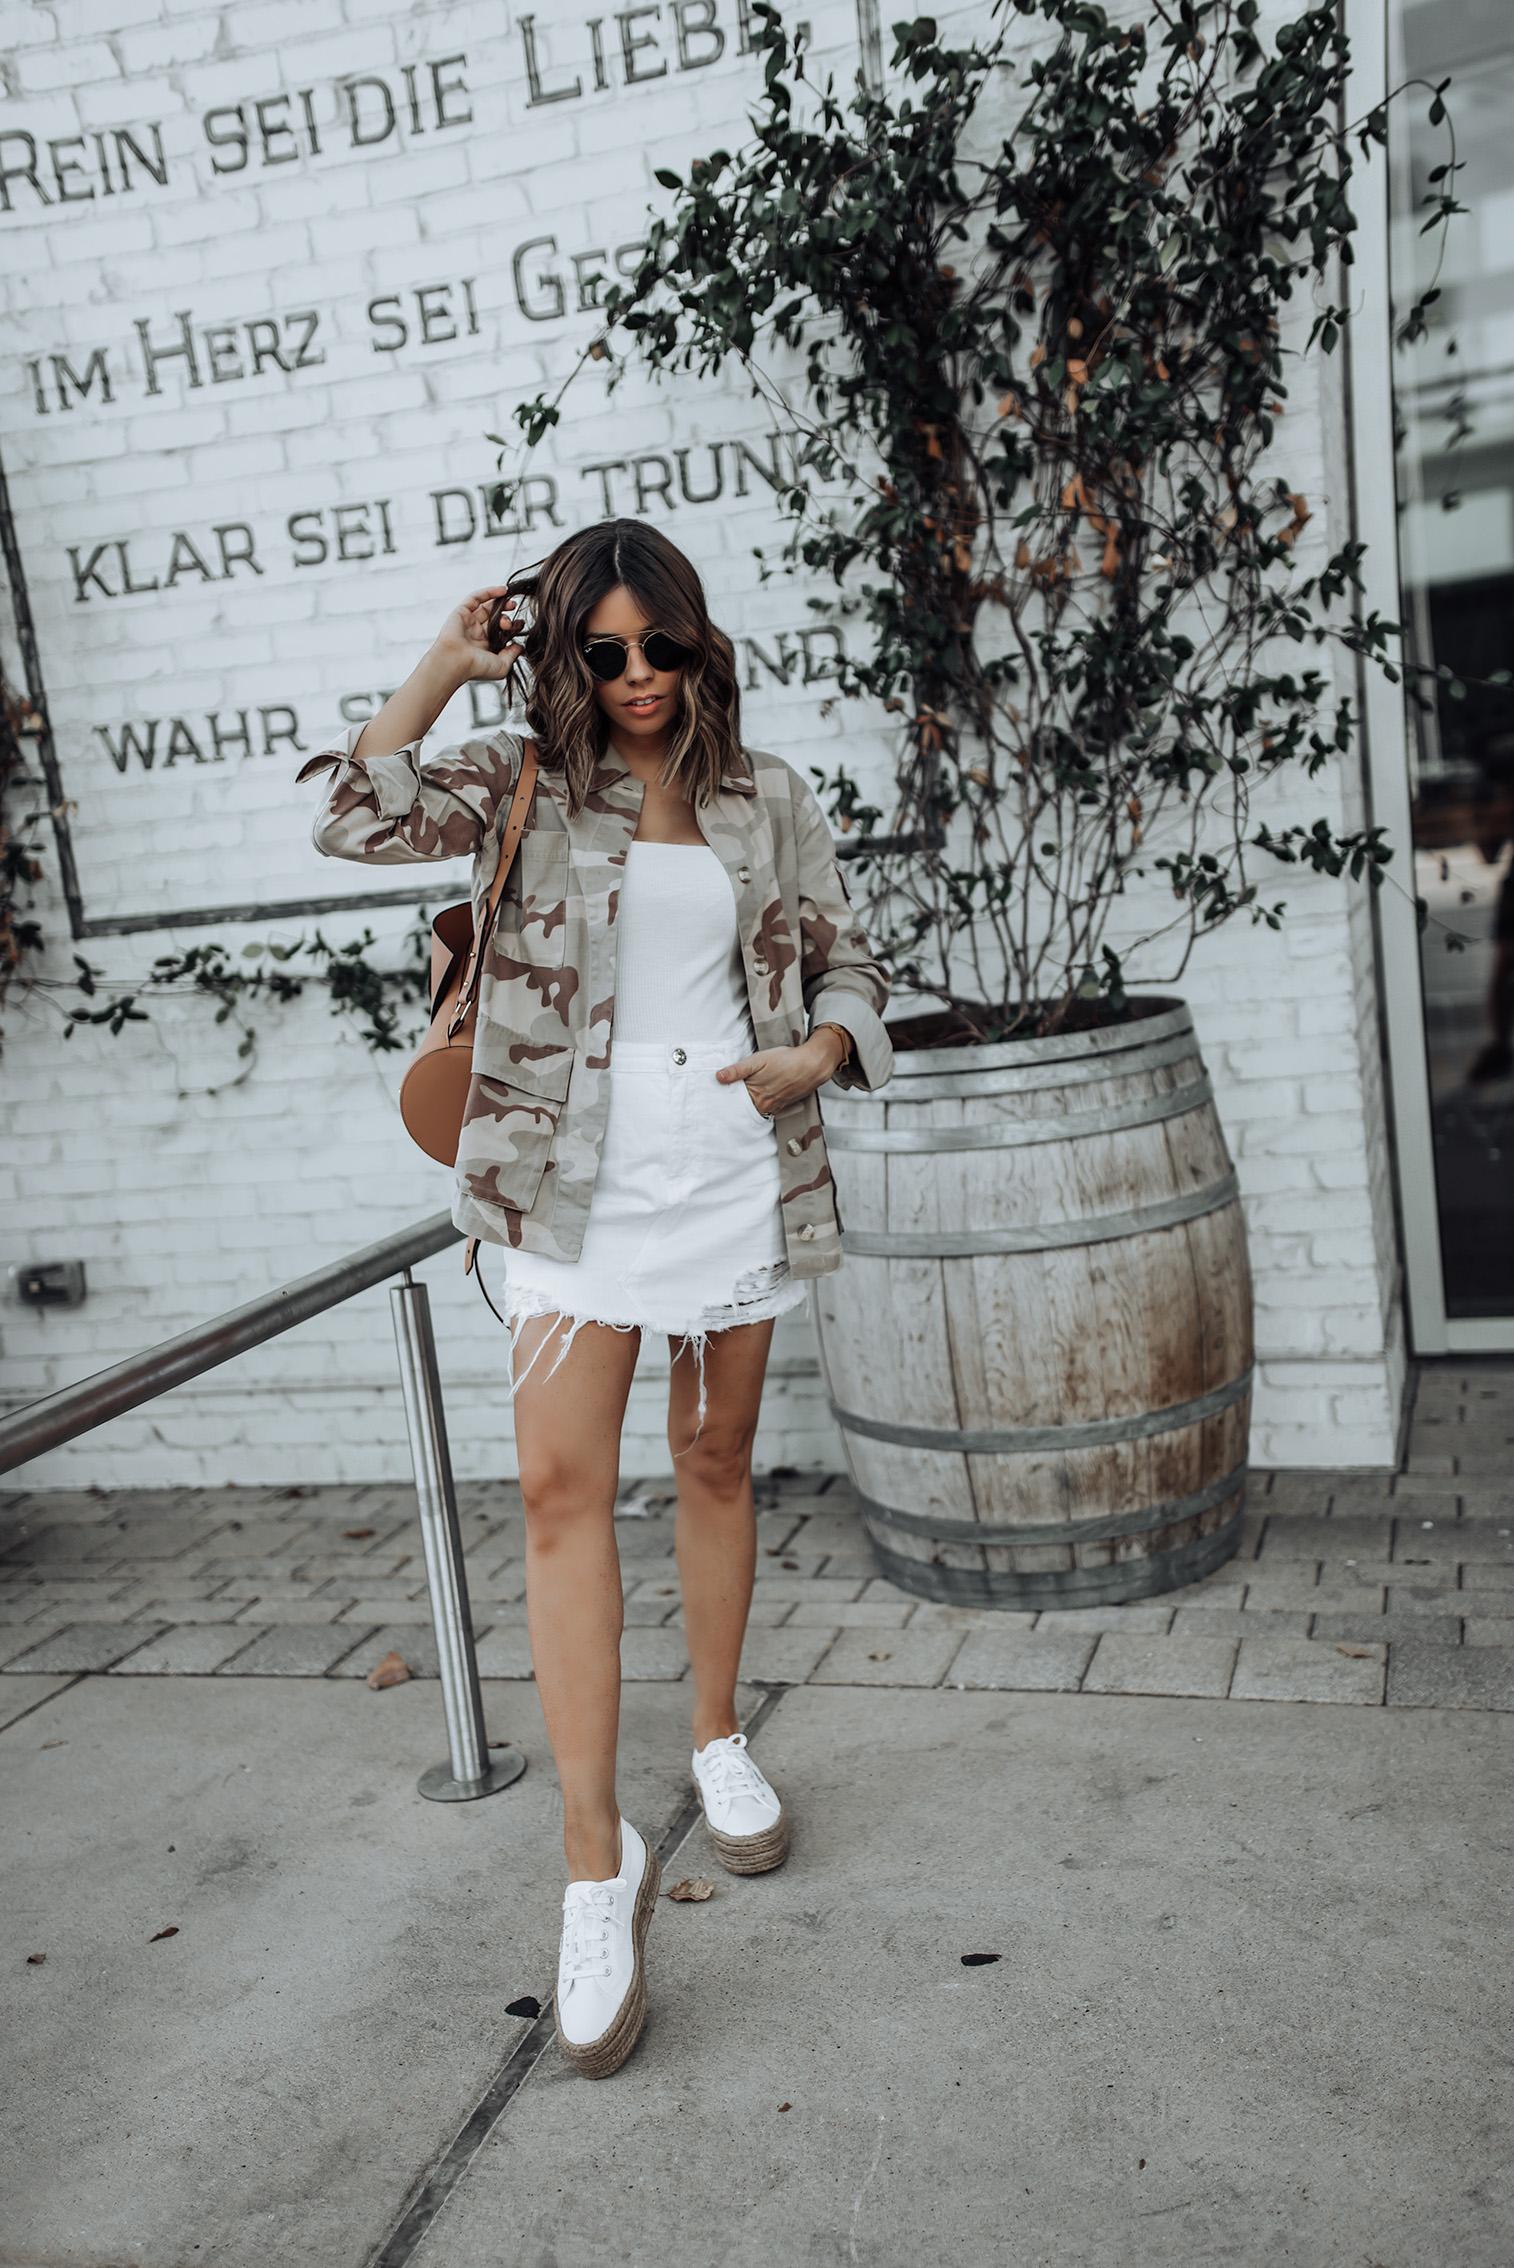 Topshop Camo Print Jacket   camo  Denim skirt   Zac Zac Posen Belay Backpack   Superga Flatform Sneakers   #sneakeroutfits #streetstyle #summeroutfits #liketkit #zaczacposen